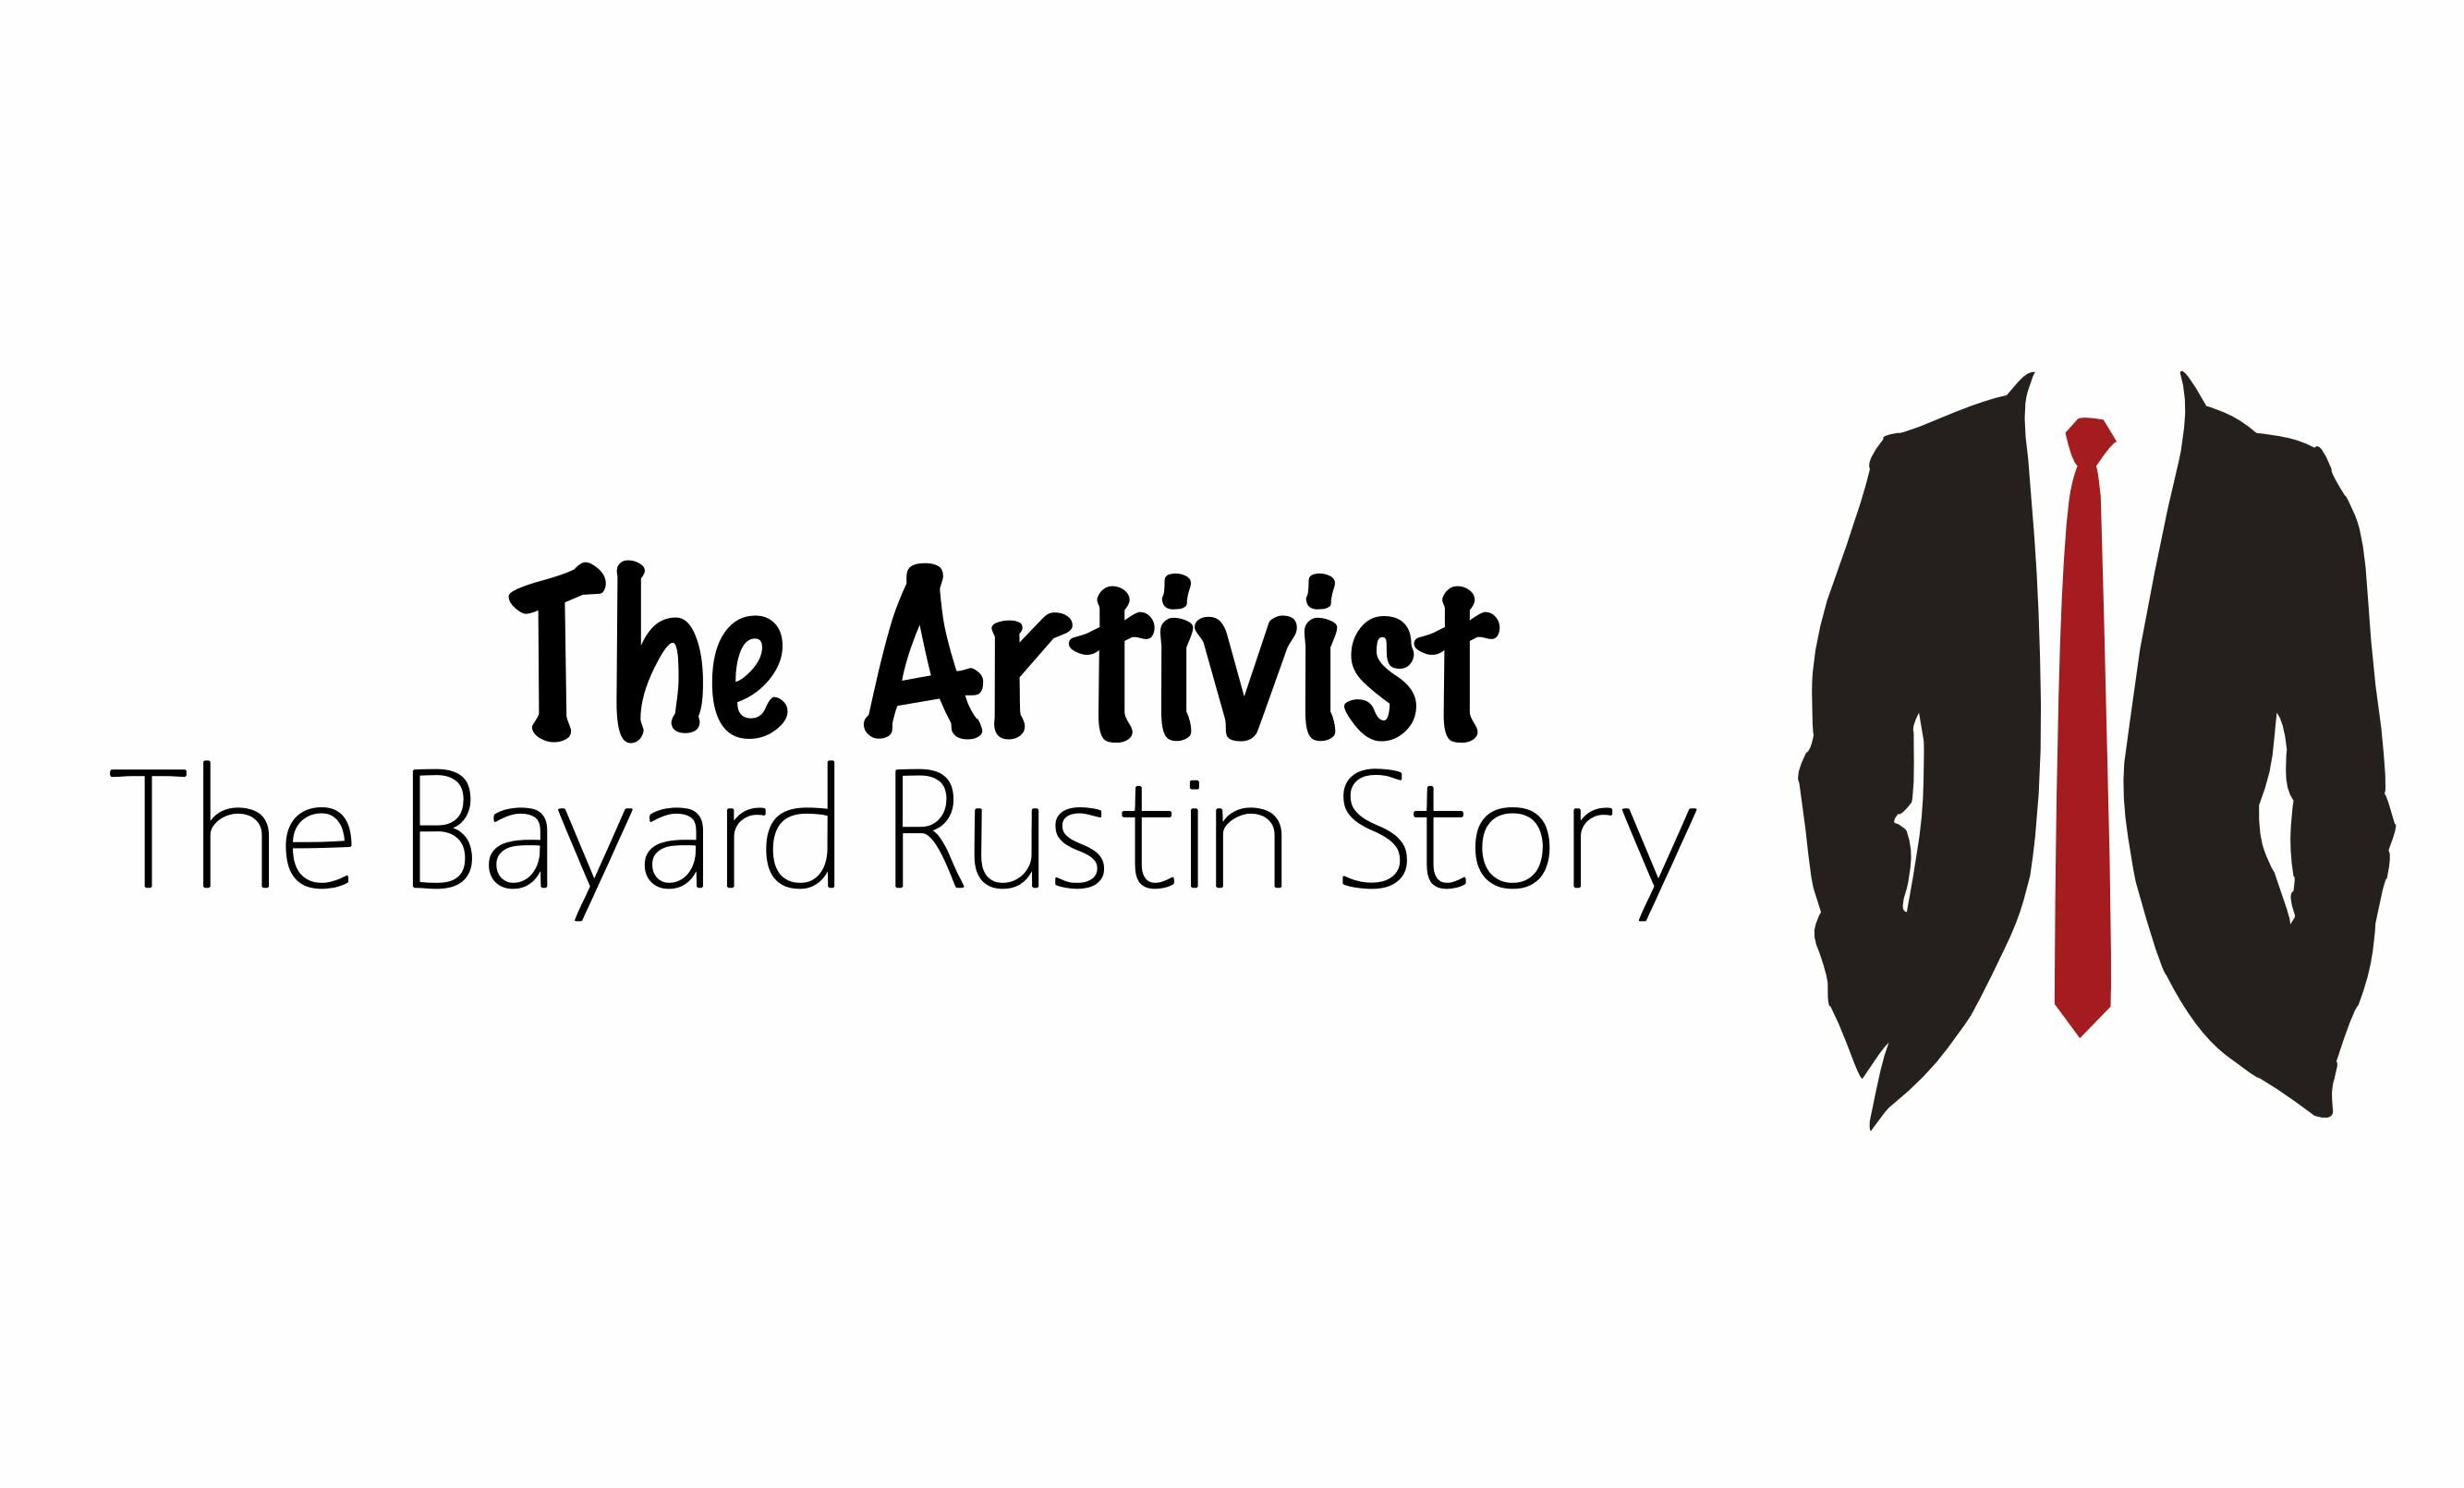 """The Artivist: The Bayard Rustin Story"""